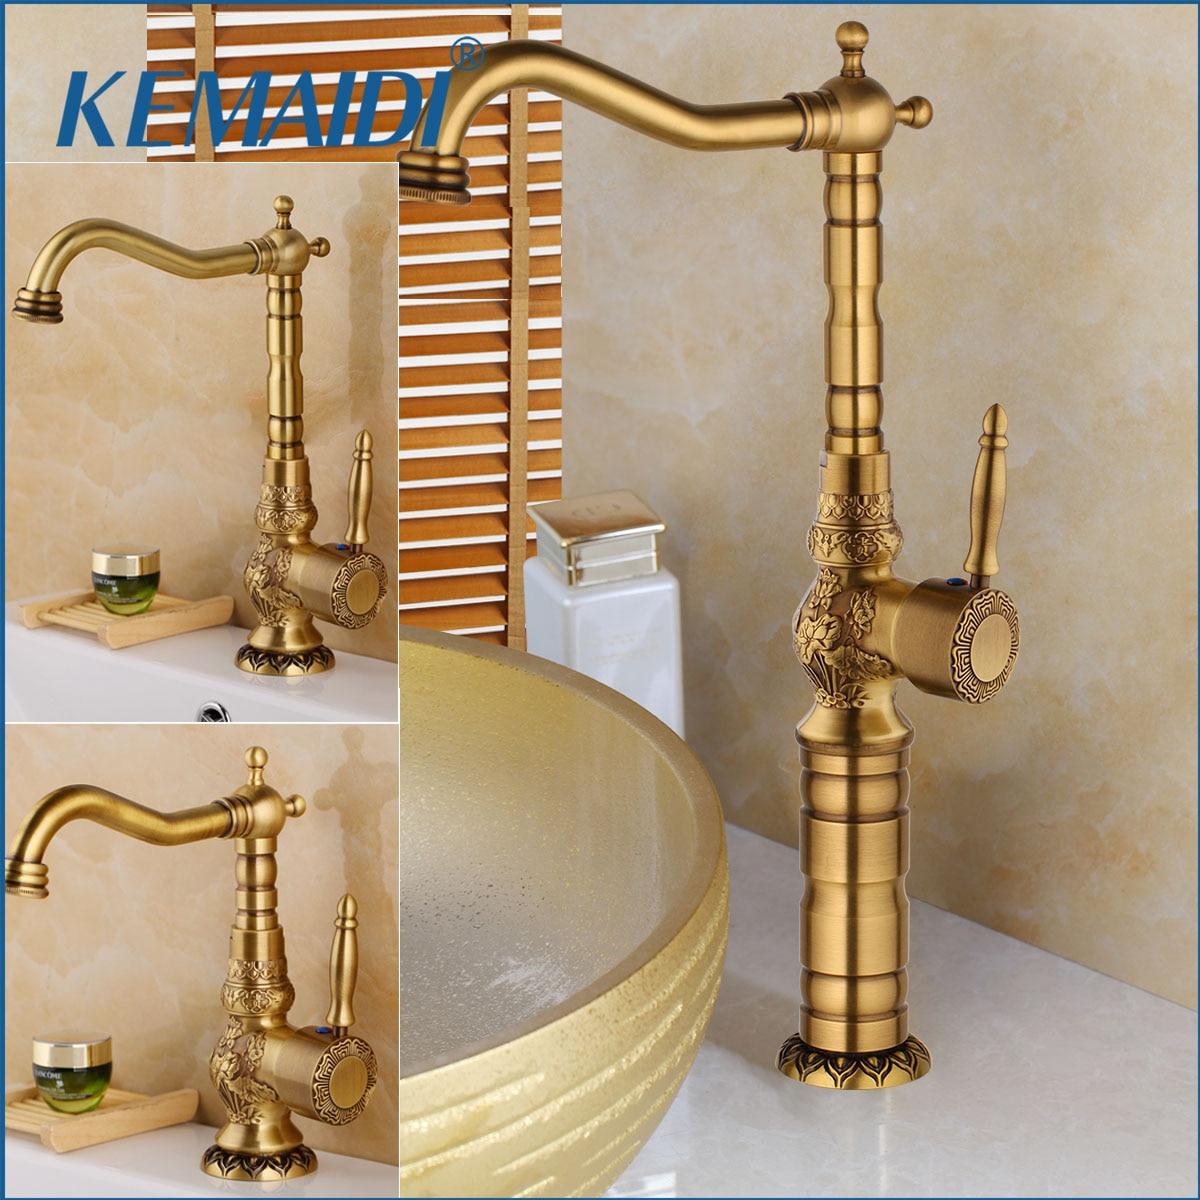 KEMAIDI 3 Size  Antique Brass Bathroom Basin Faucet Long Nose Spout Wash Sink Tap 360 Rotation Single Handle Mixer torneirasKEMAIDI 3 Size  Antique Brass Bathroom Basin Faucet Long Nose Spout Wash Sink Tap 360 Rotation Single Handle Mixer torneiras